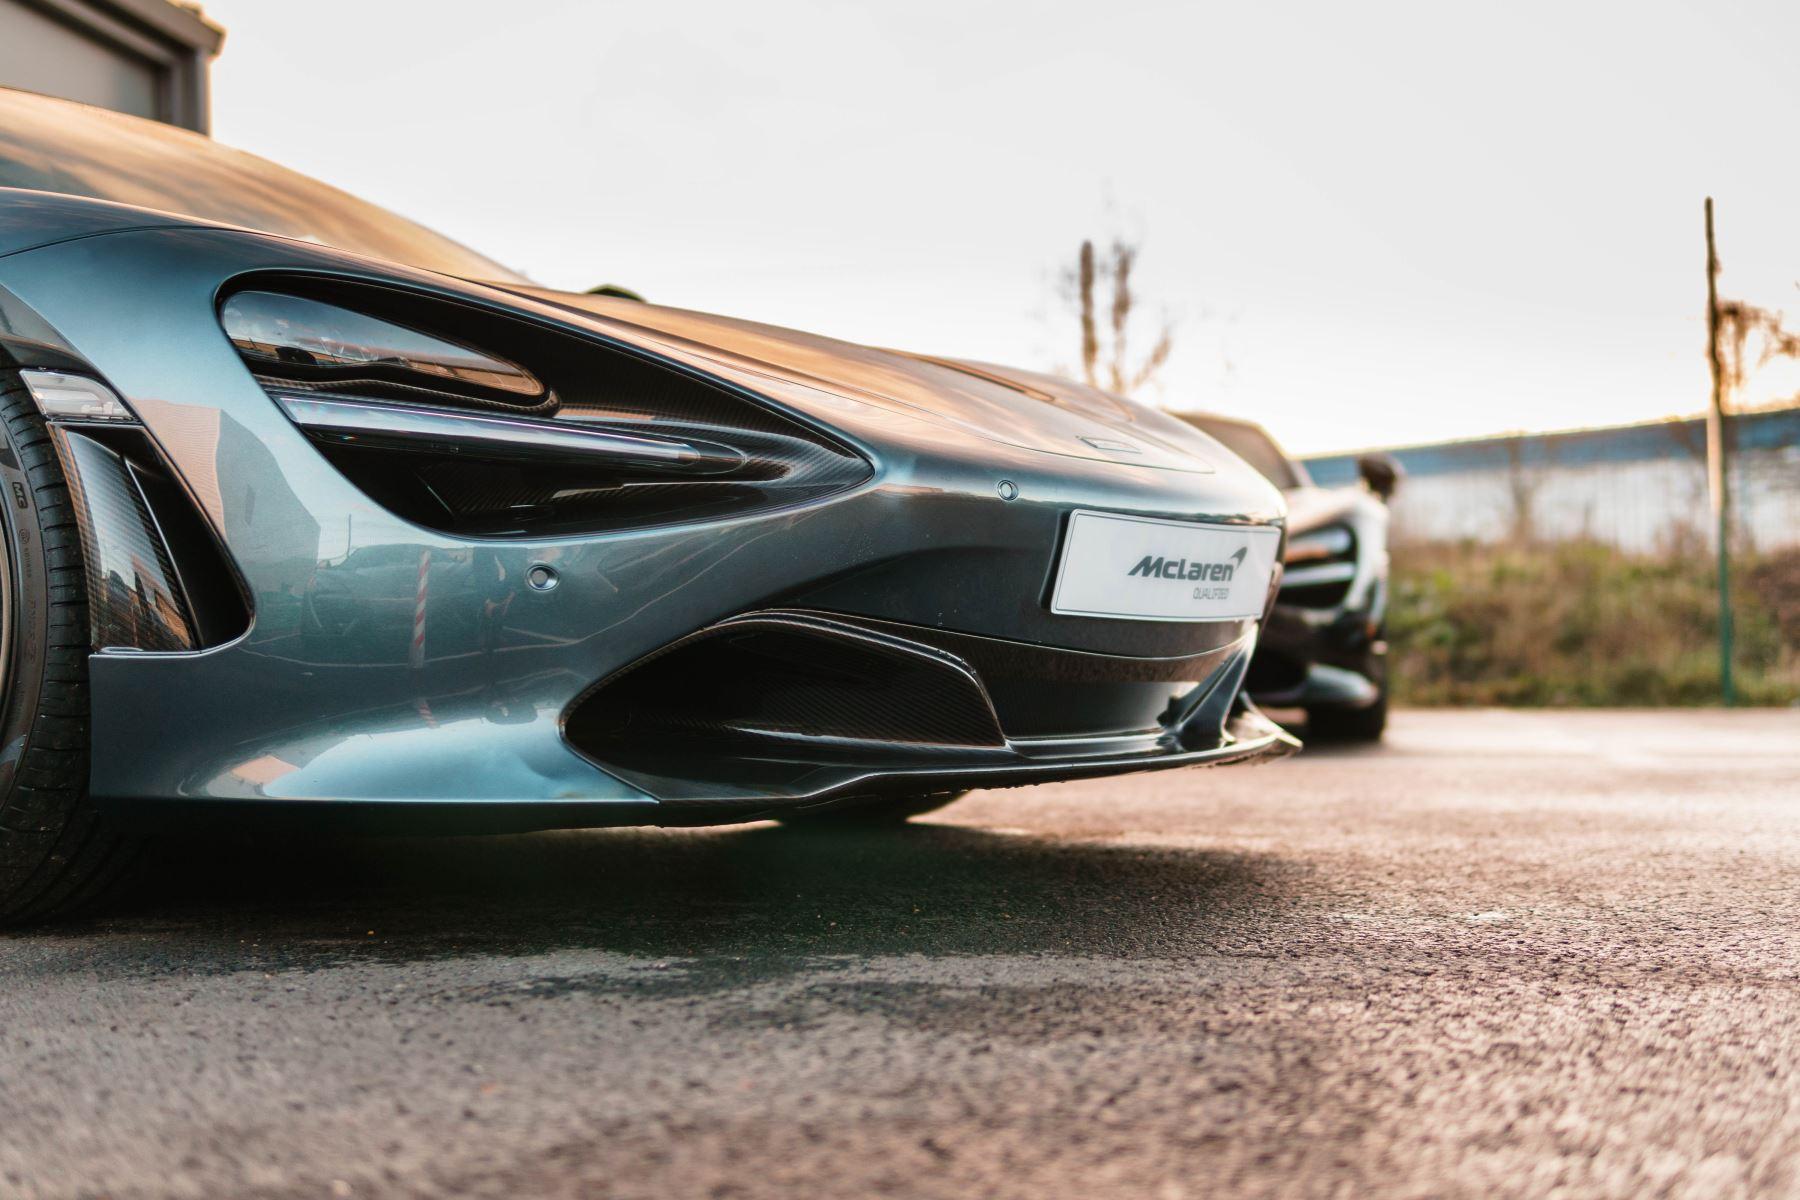 McLaren 720S Performance Coupe  image 34